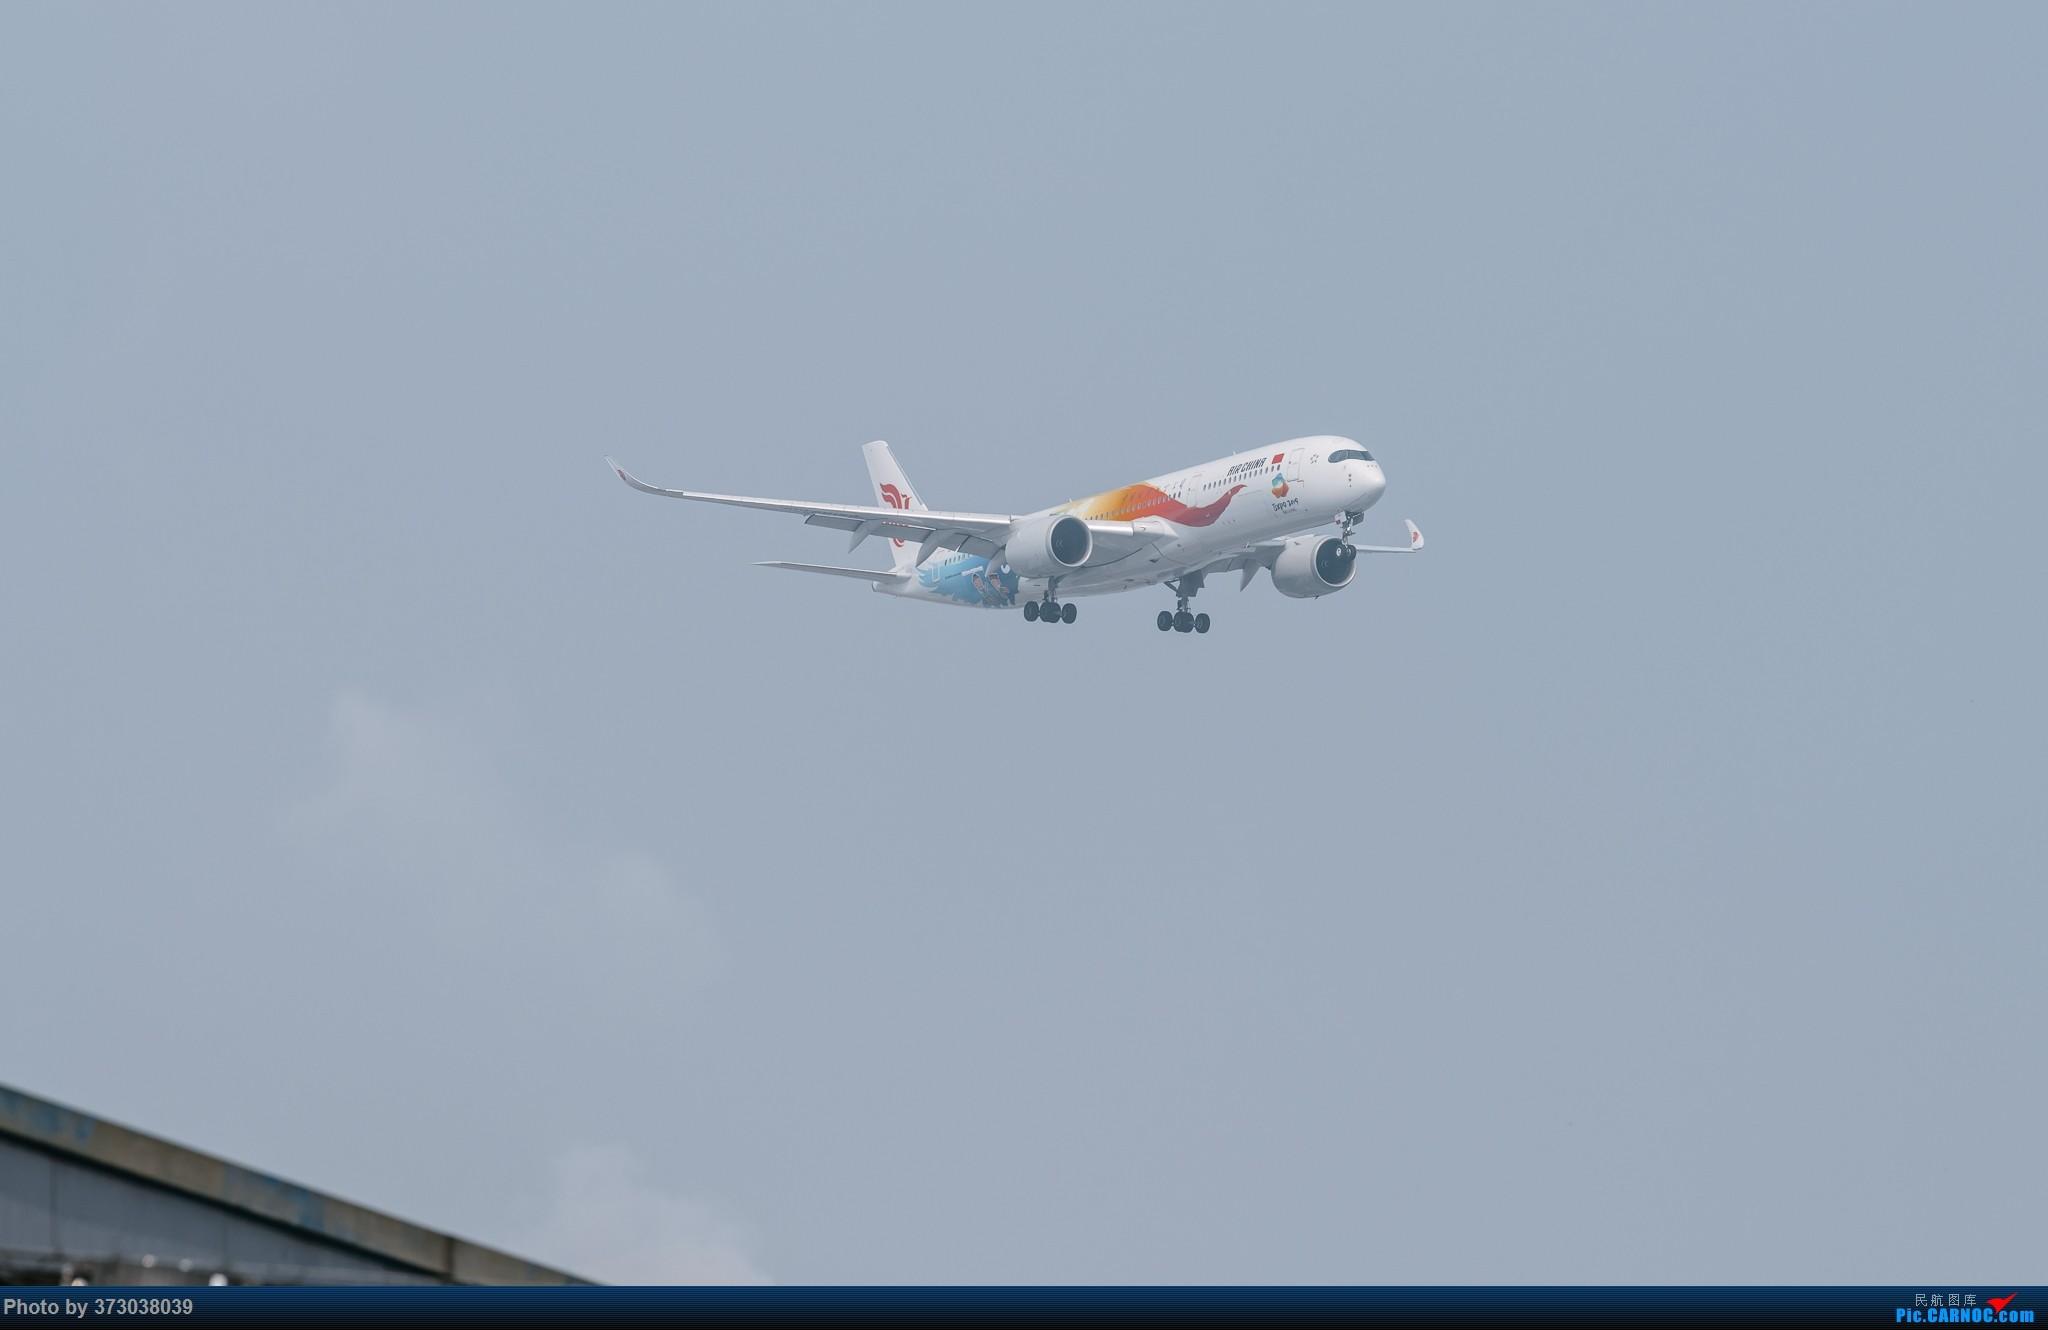 "Re:[原创]【杭州飞友会】国航A350""多彩世园号""彩绘落地 杭州萧山机场 AIRBUS A350-900 B-1083 中国杭州萧山国际机场"